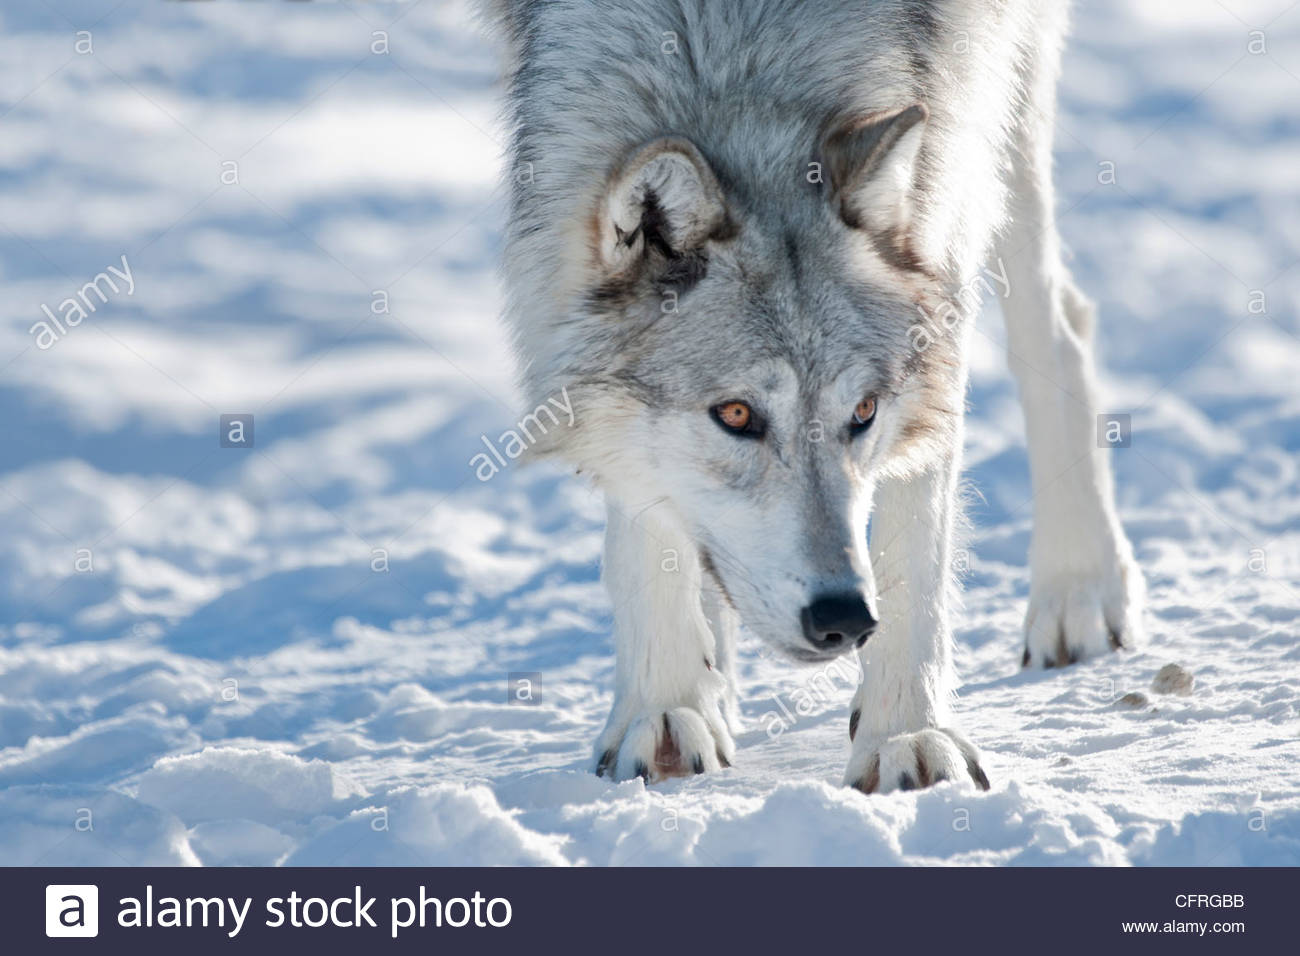 Alaskan Tundra wolf (Canis lupus tundrarum), Montana, United States of America, North America - Stock Image